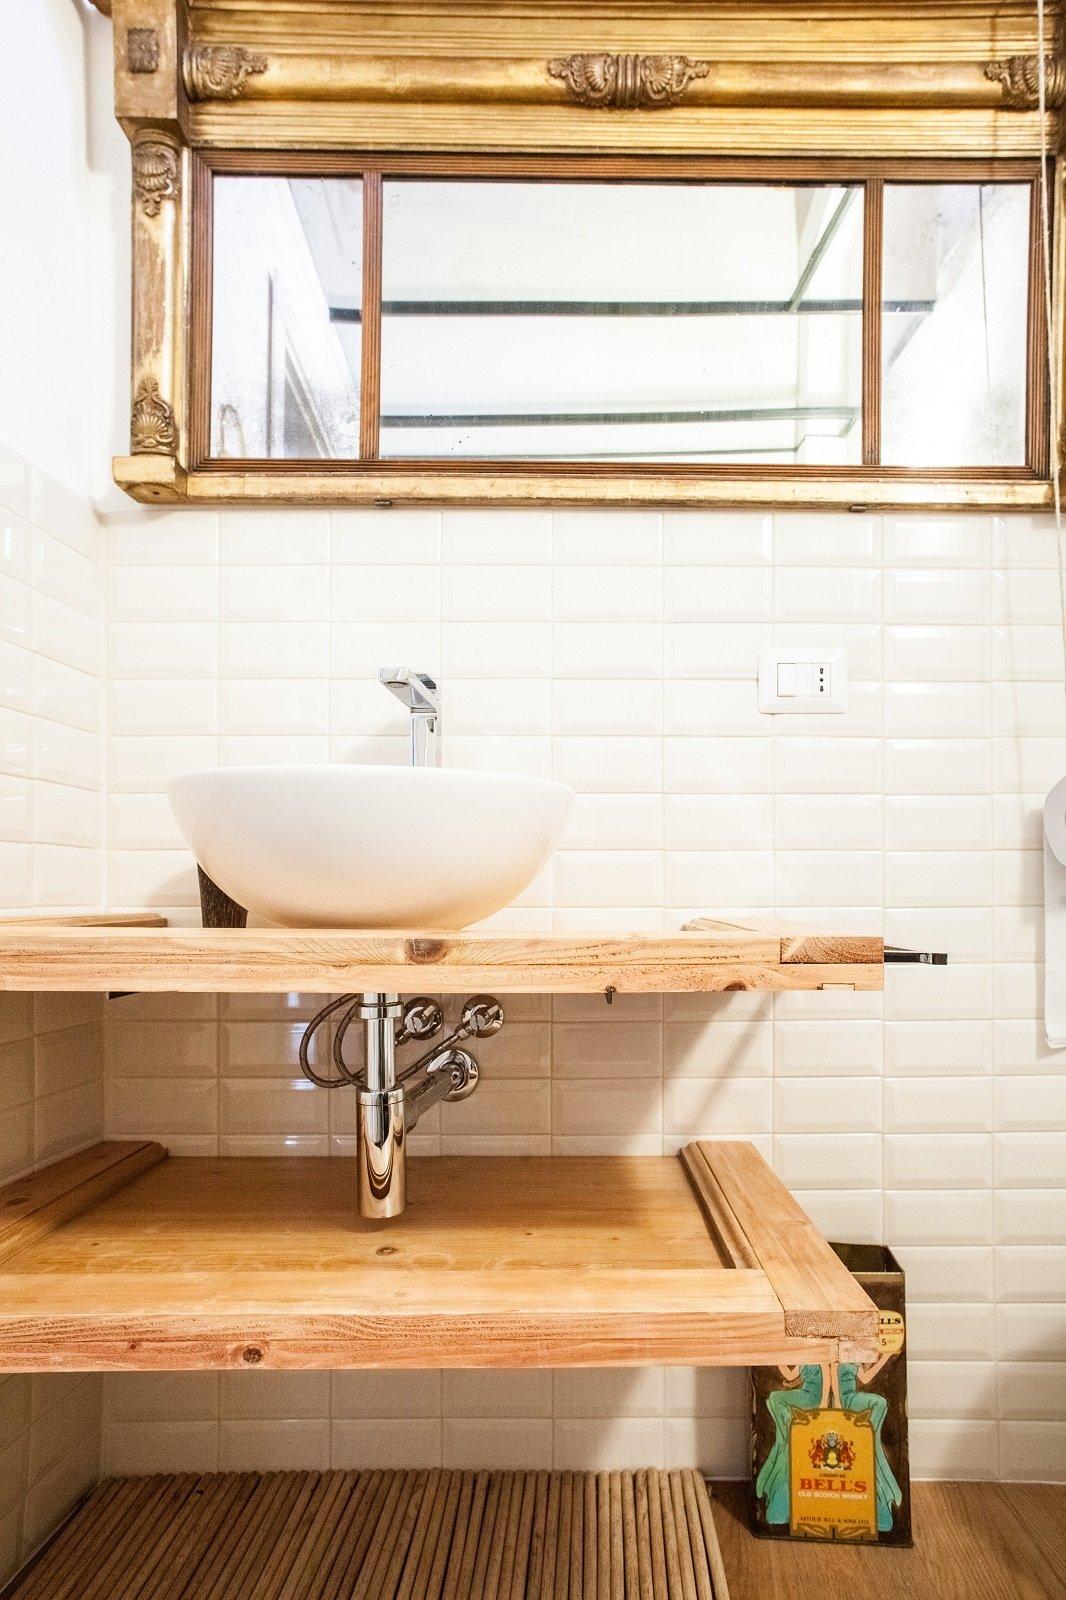 11 img 0760 bagno padronale d cose di casa - Bagno padronale ...